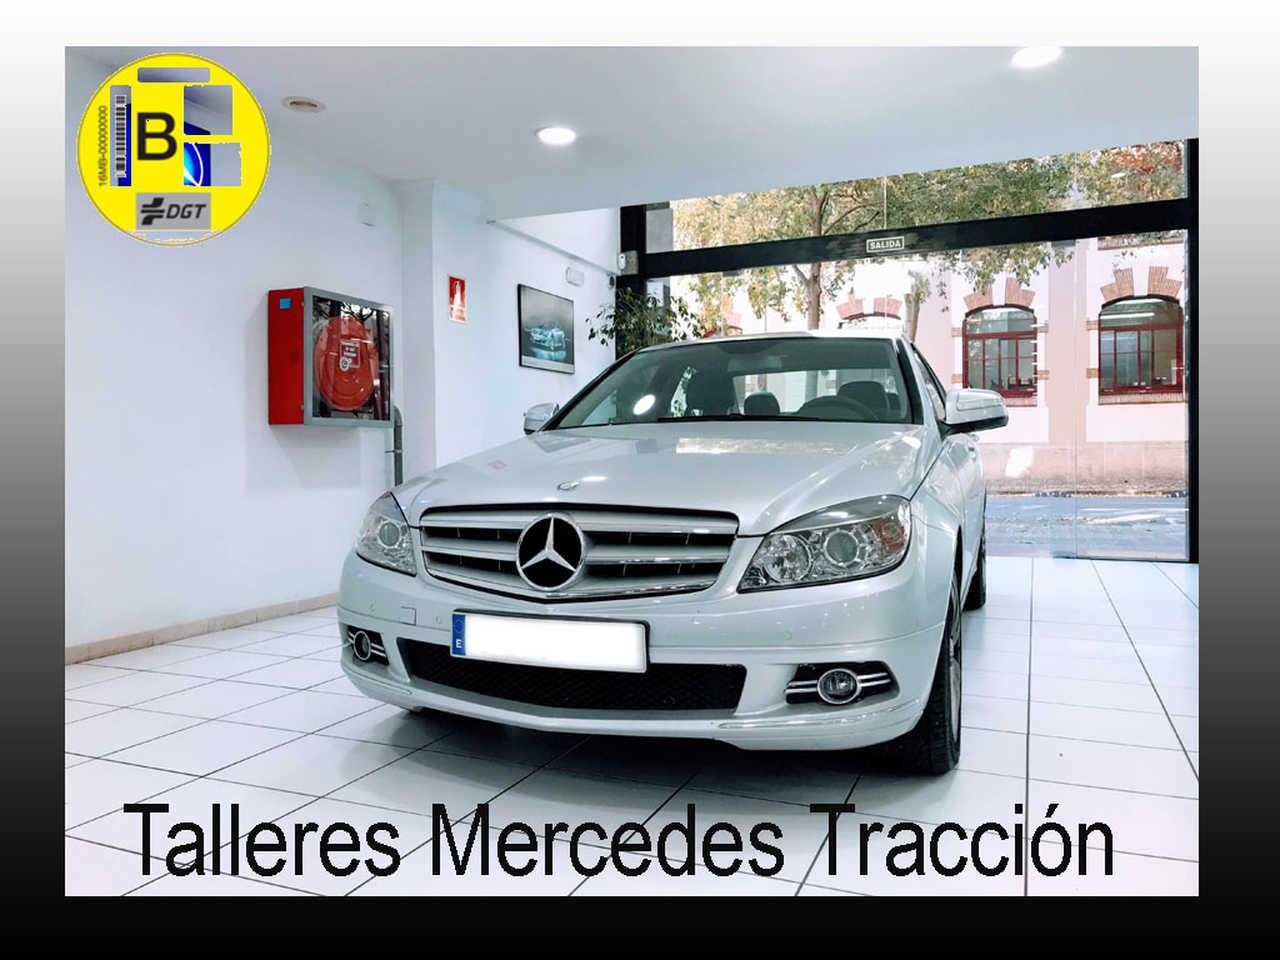 Mercedes Clase C 220 CDI/Avantgarde/Automático/64.000 km   - Foto 1